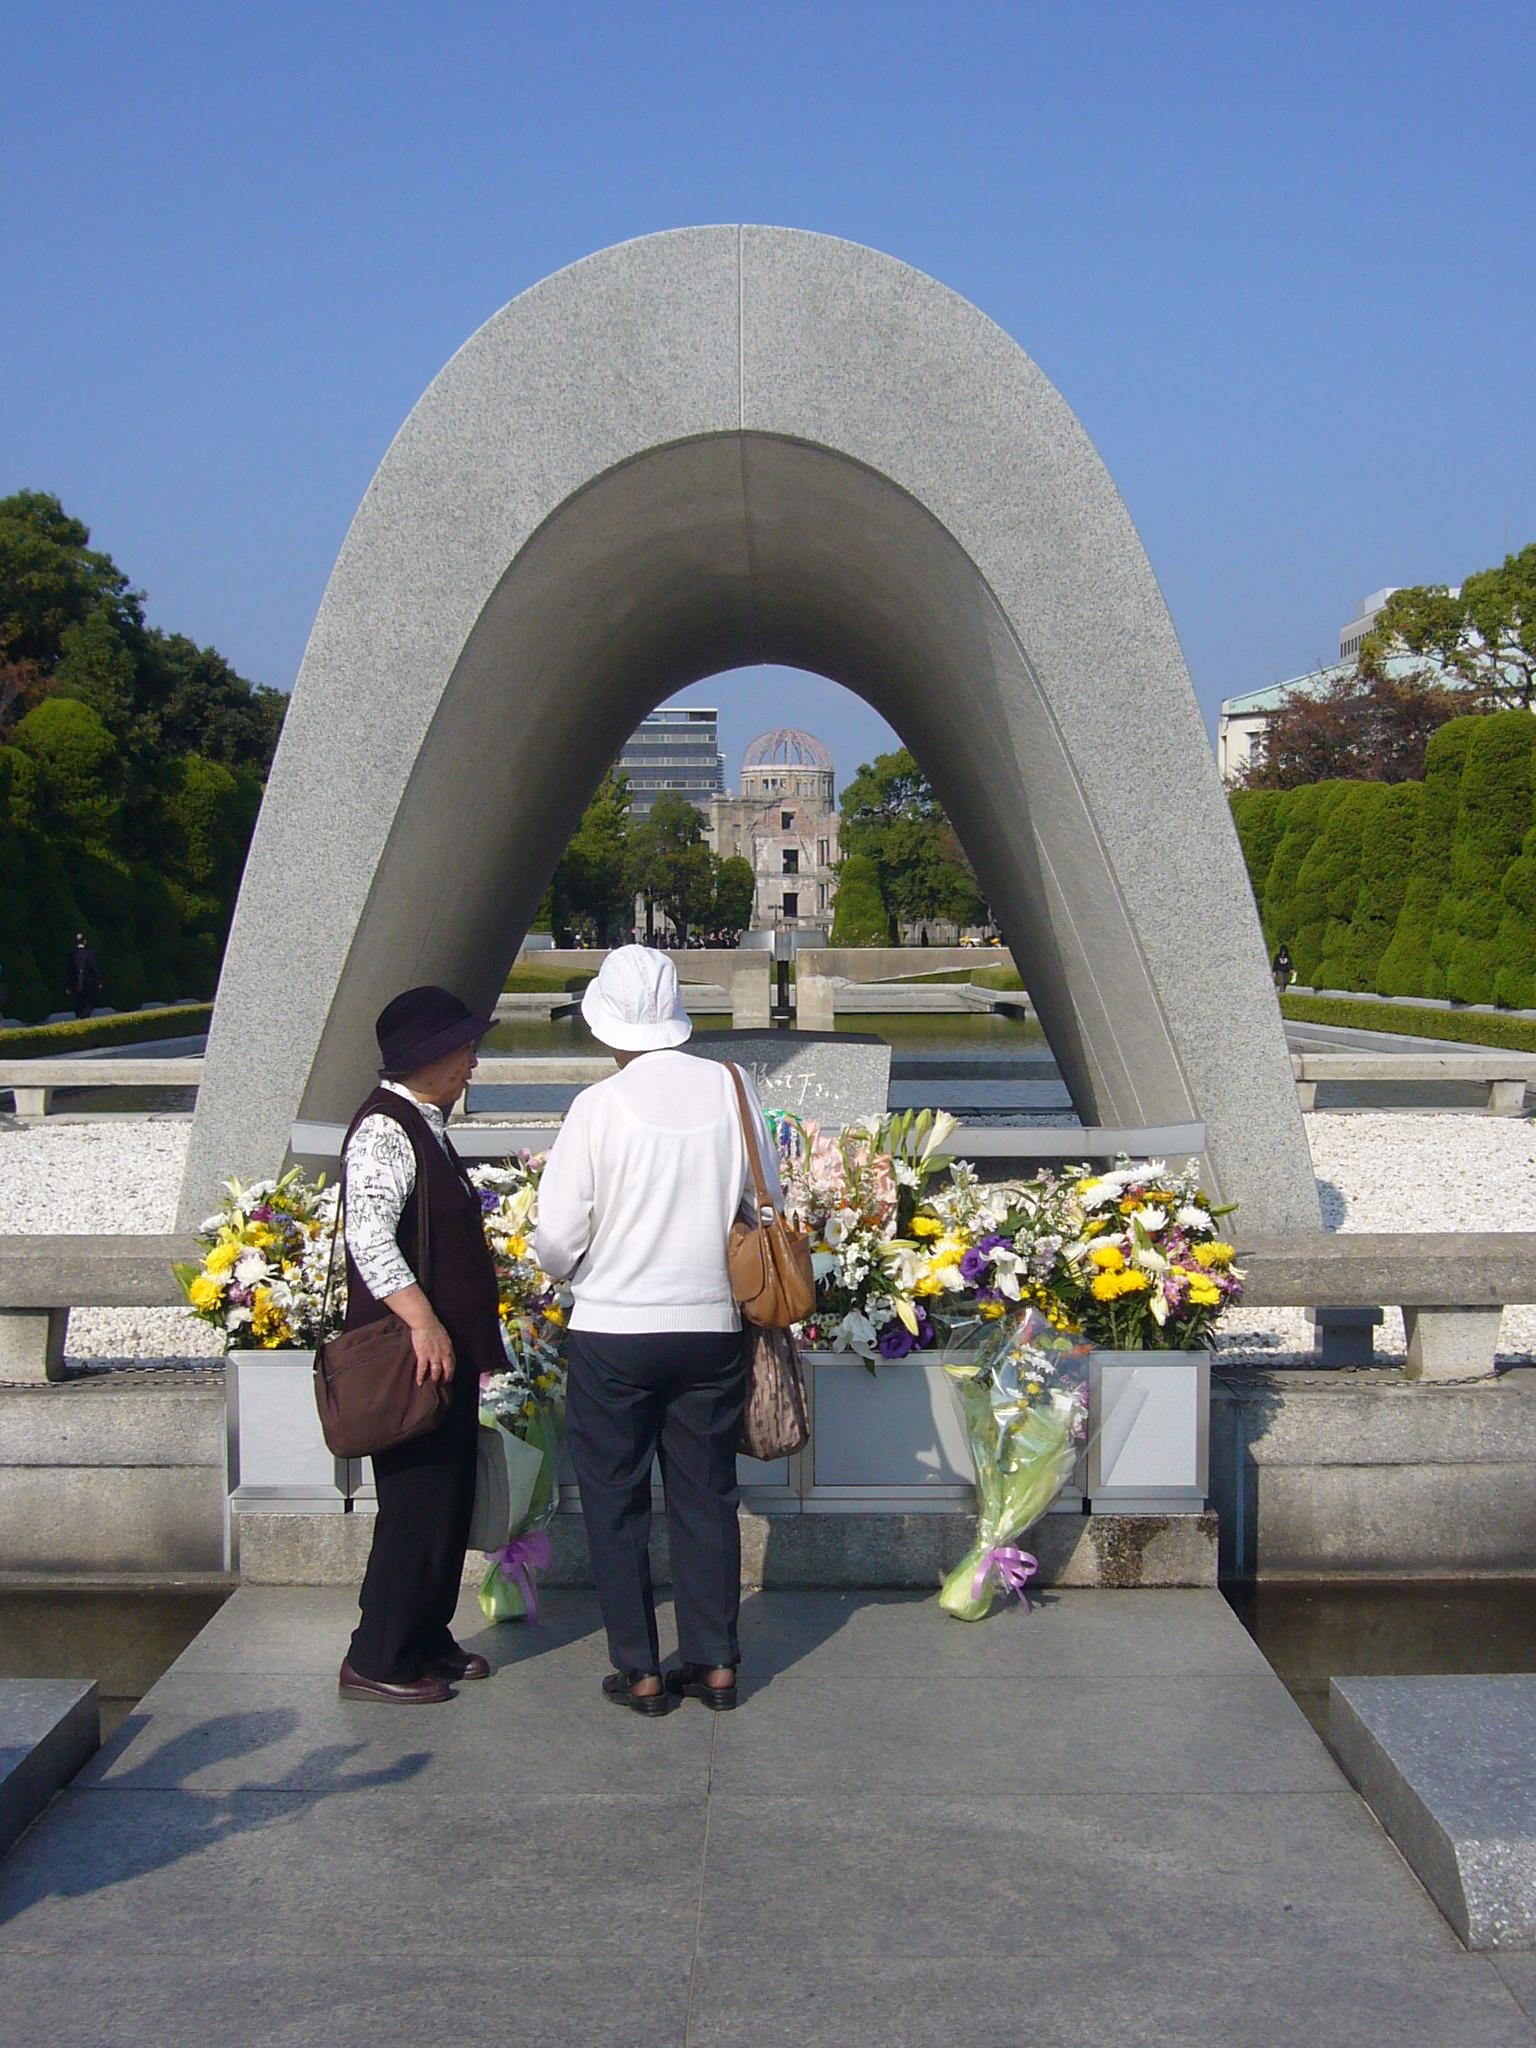 Mémorial de la paix d'Hiroshima (Dôme de Genbaku), Japon © UNESCO / Giovanni Boccardi